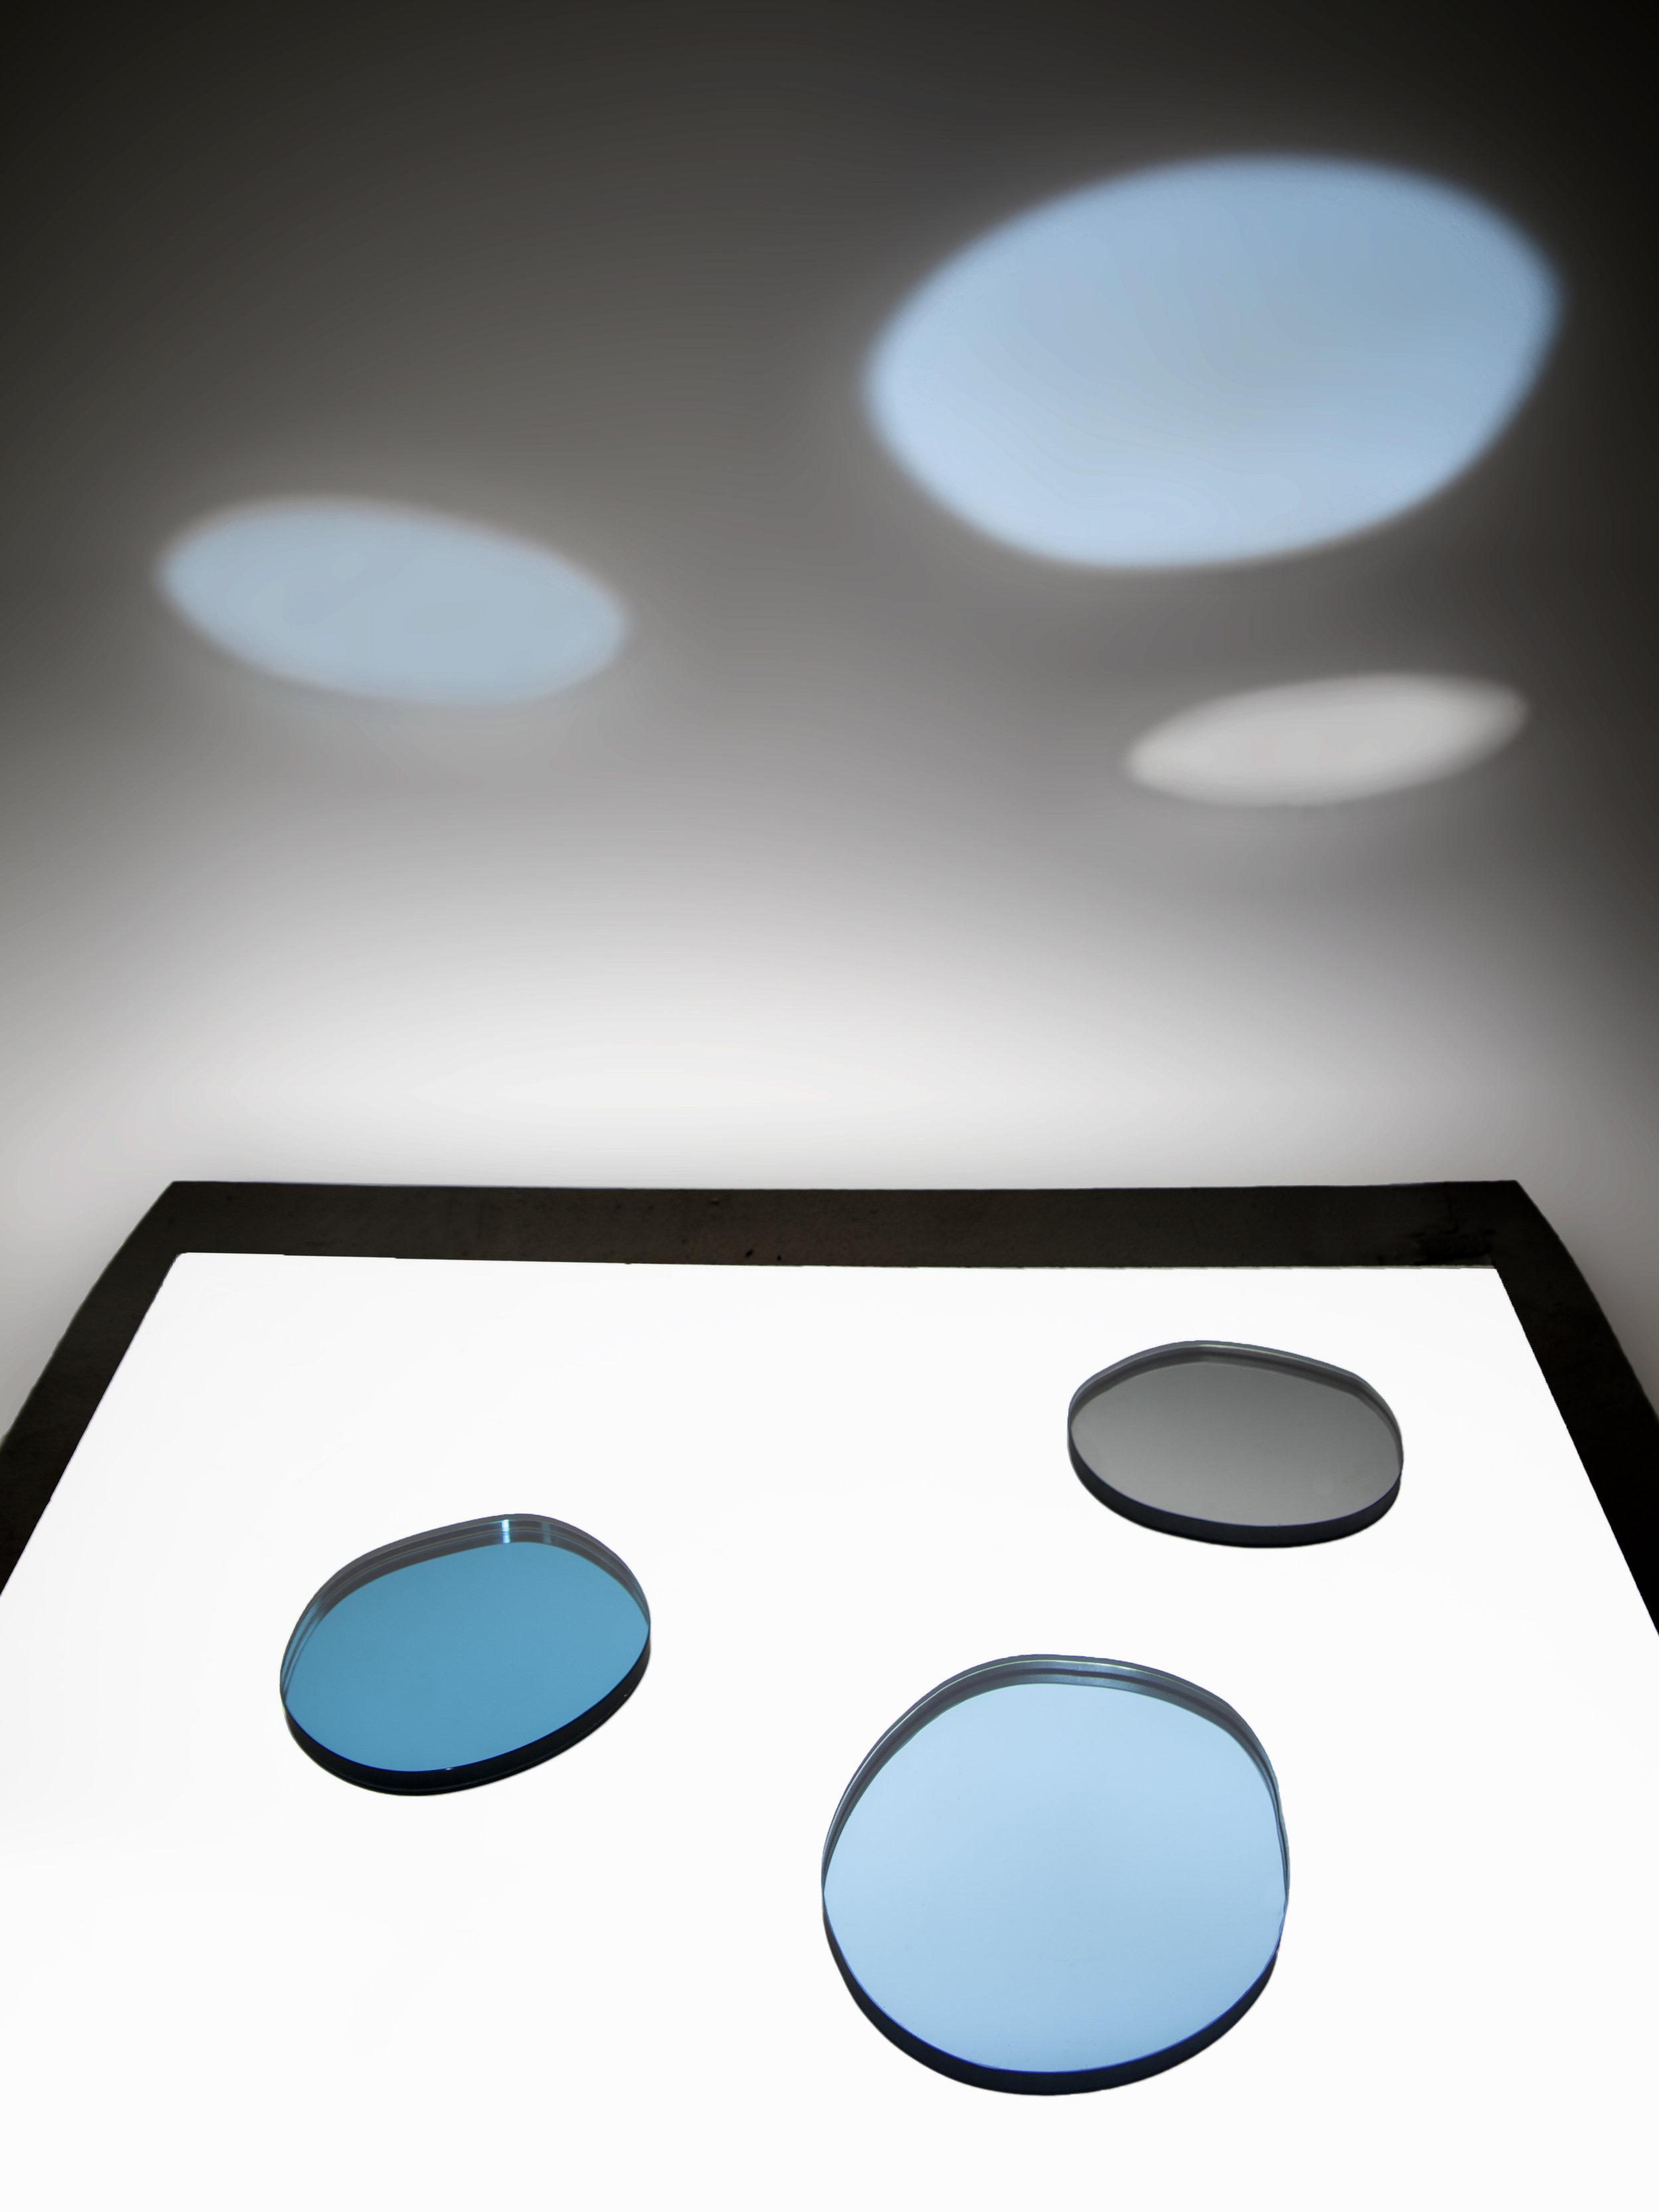 9Seeing_Glass_Photo_LEE_WEI_SWEE_LE_STUDIO_COCO.jpg